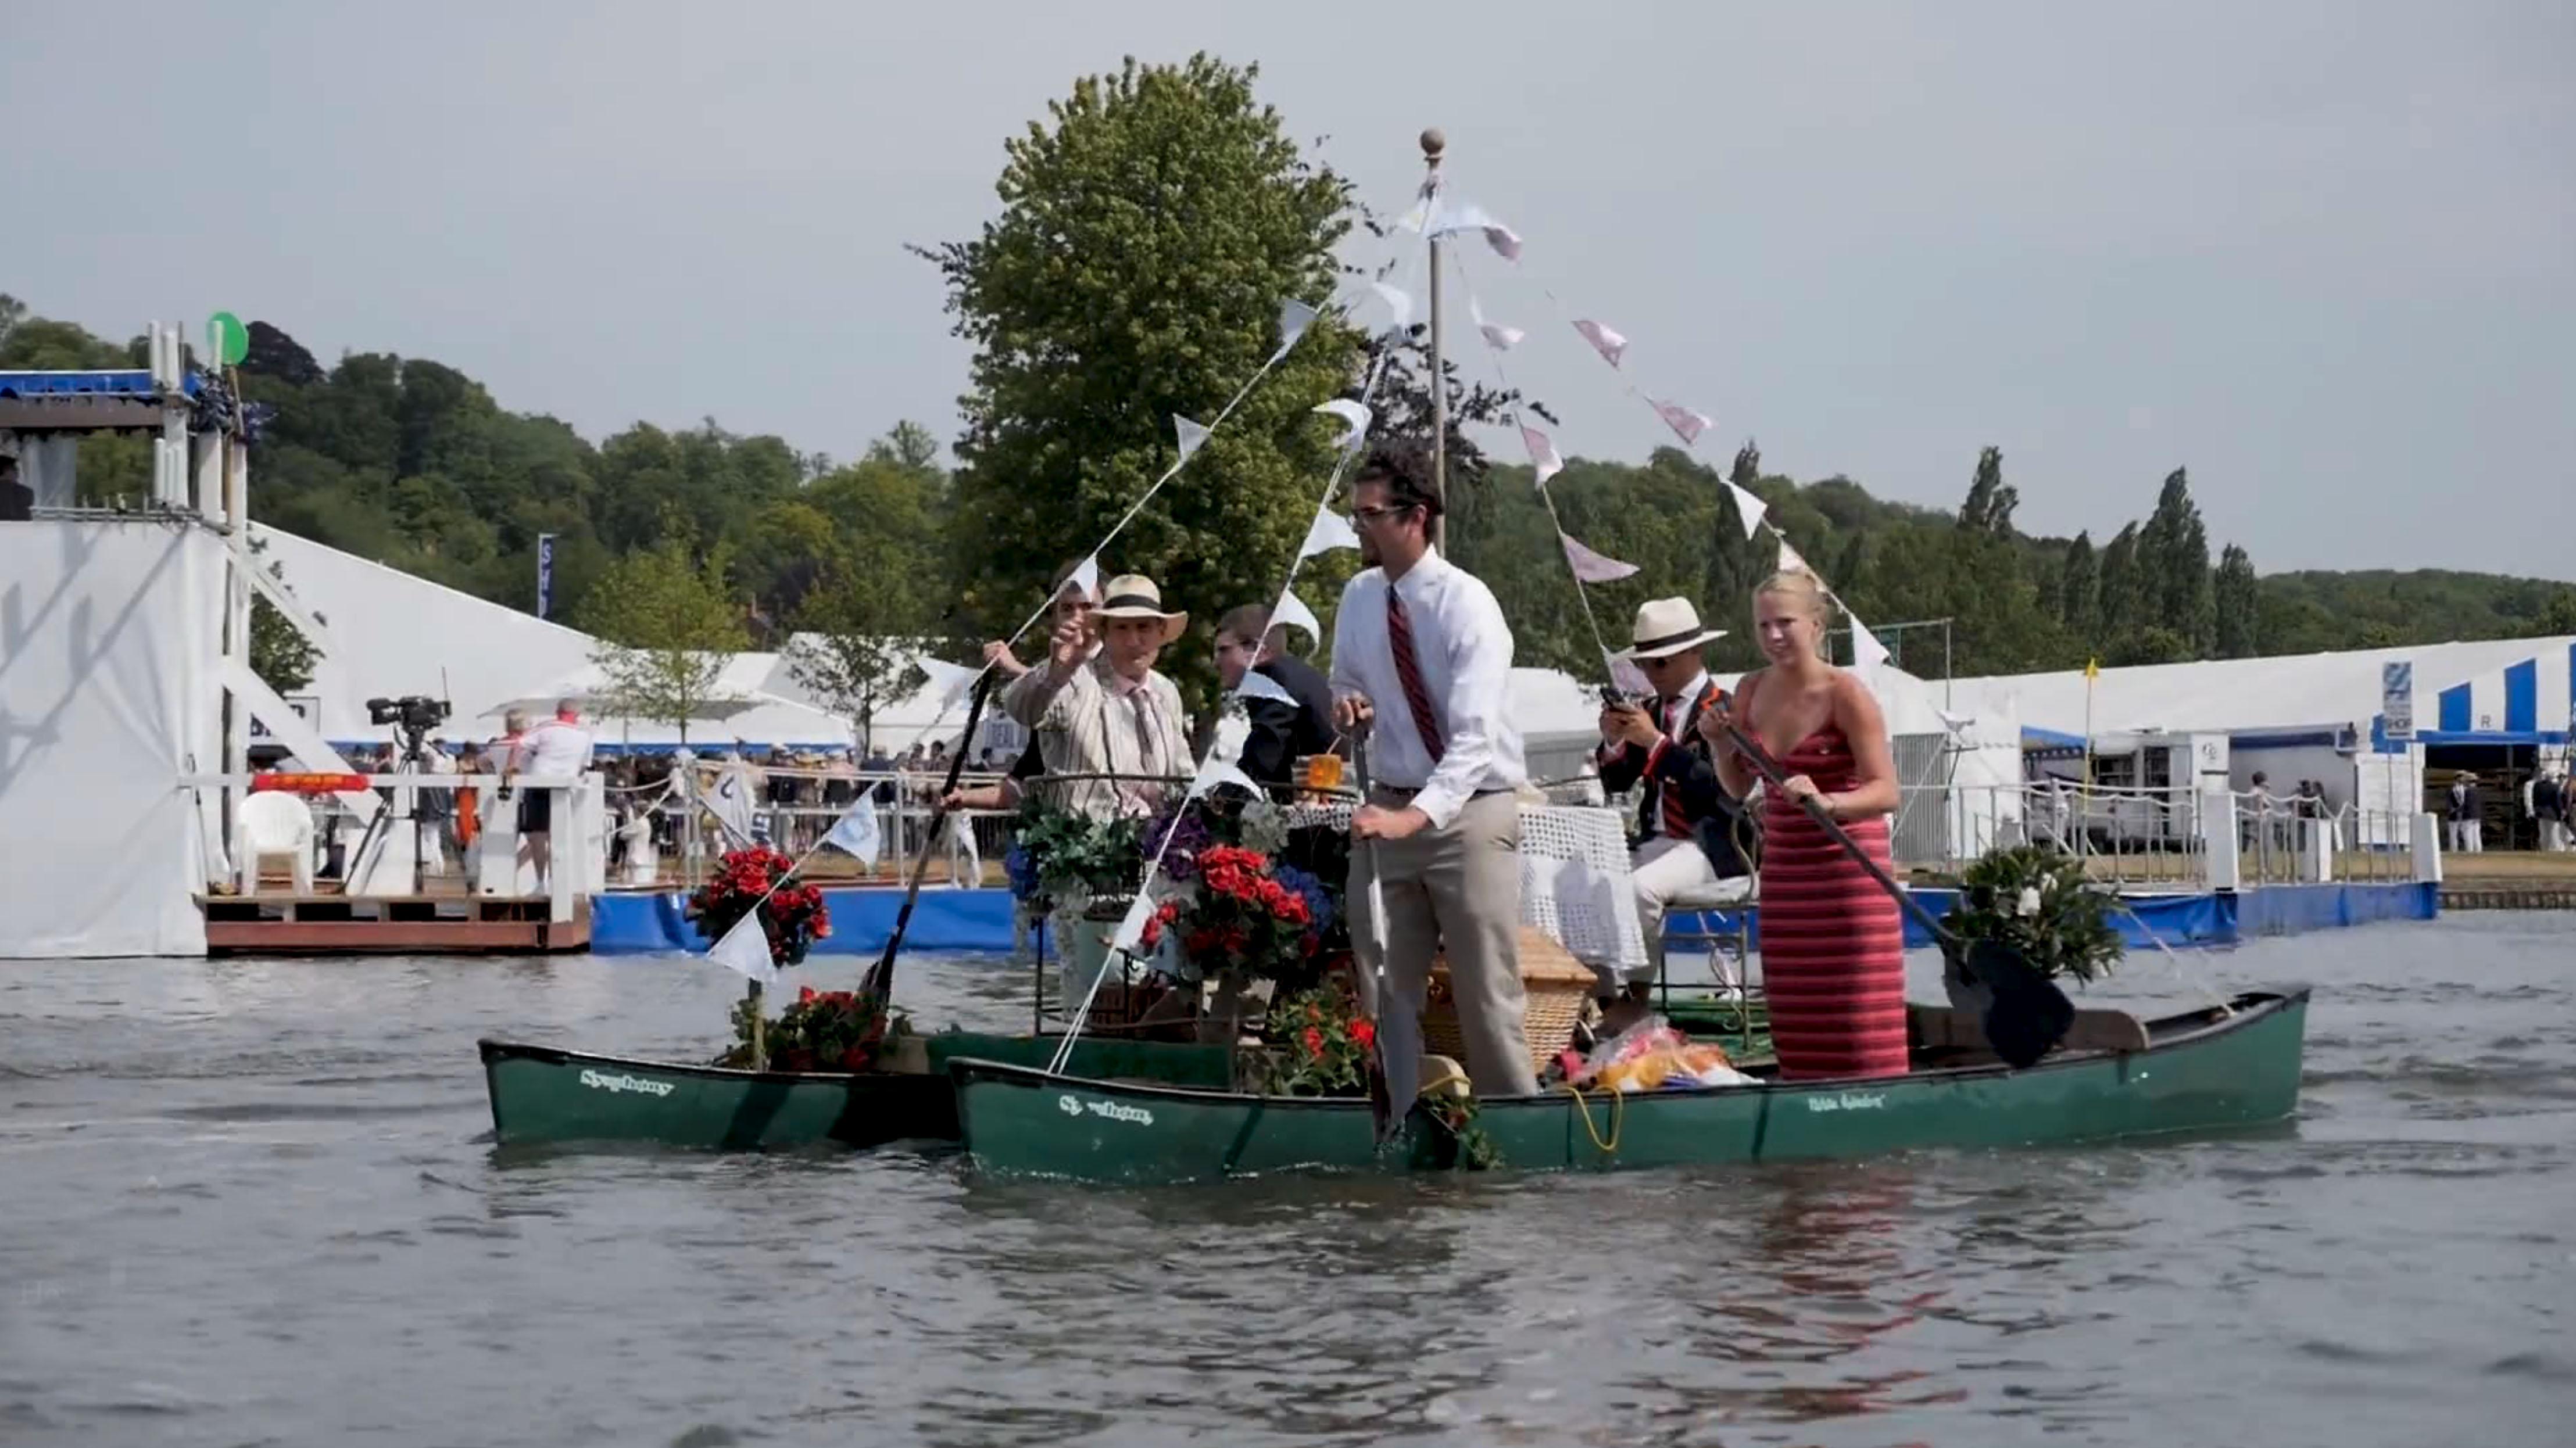 Henley Town Council - boats during the Henley Royal Regatta